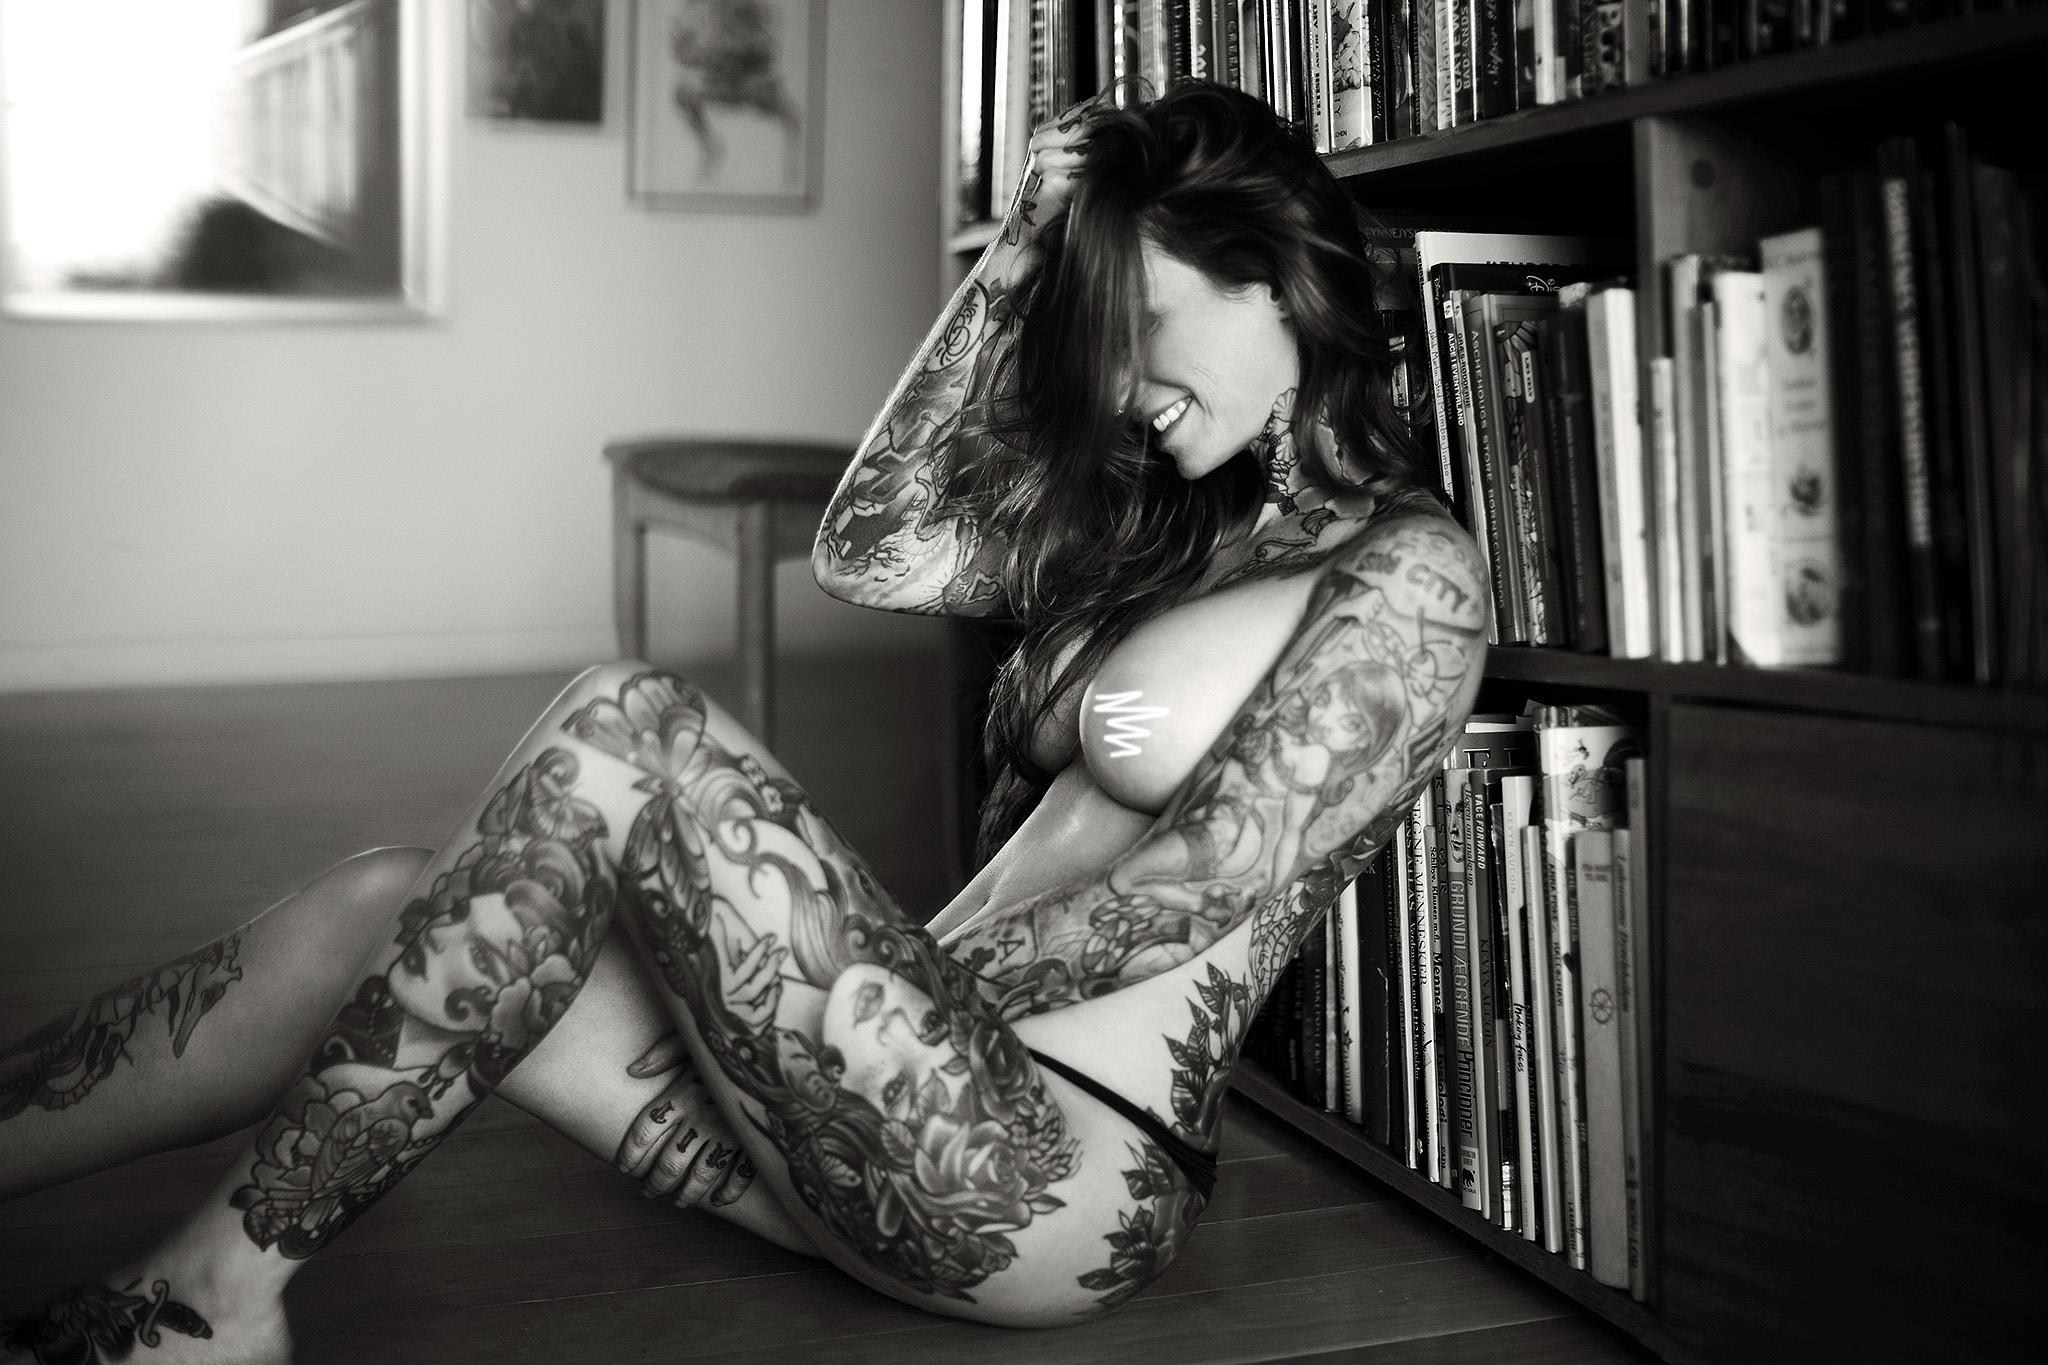 Mikkel_Laumann_Photography_Anne_Lindfjeld_Reroute_To_Remain_Photoshoot_Magazine_03.jpg